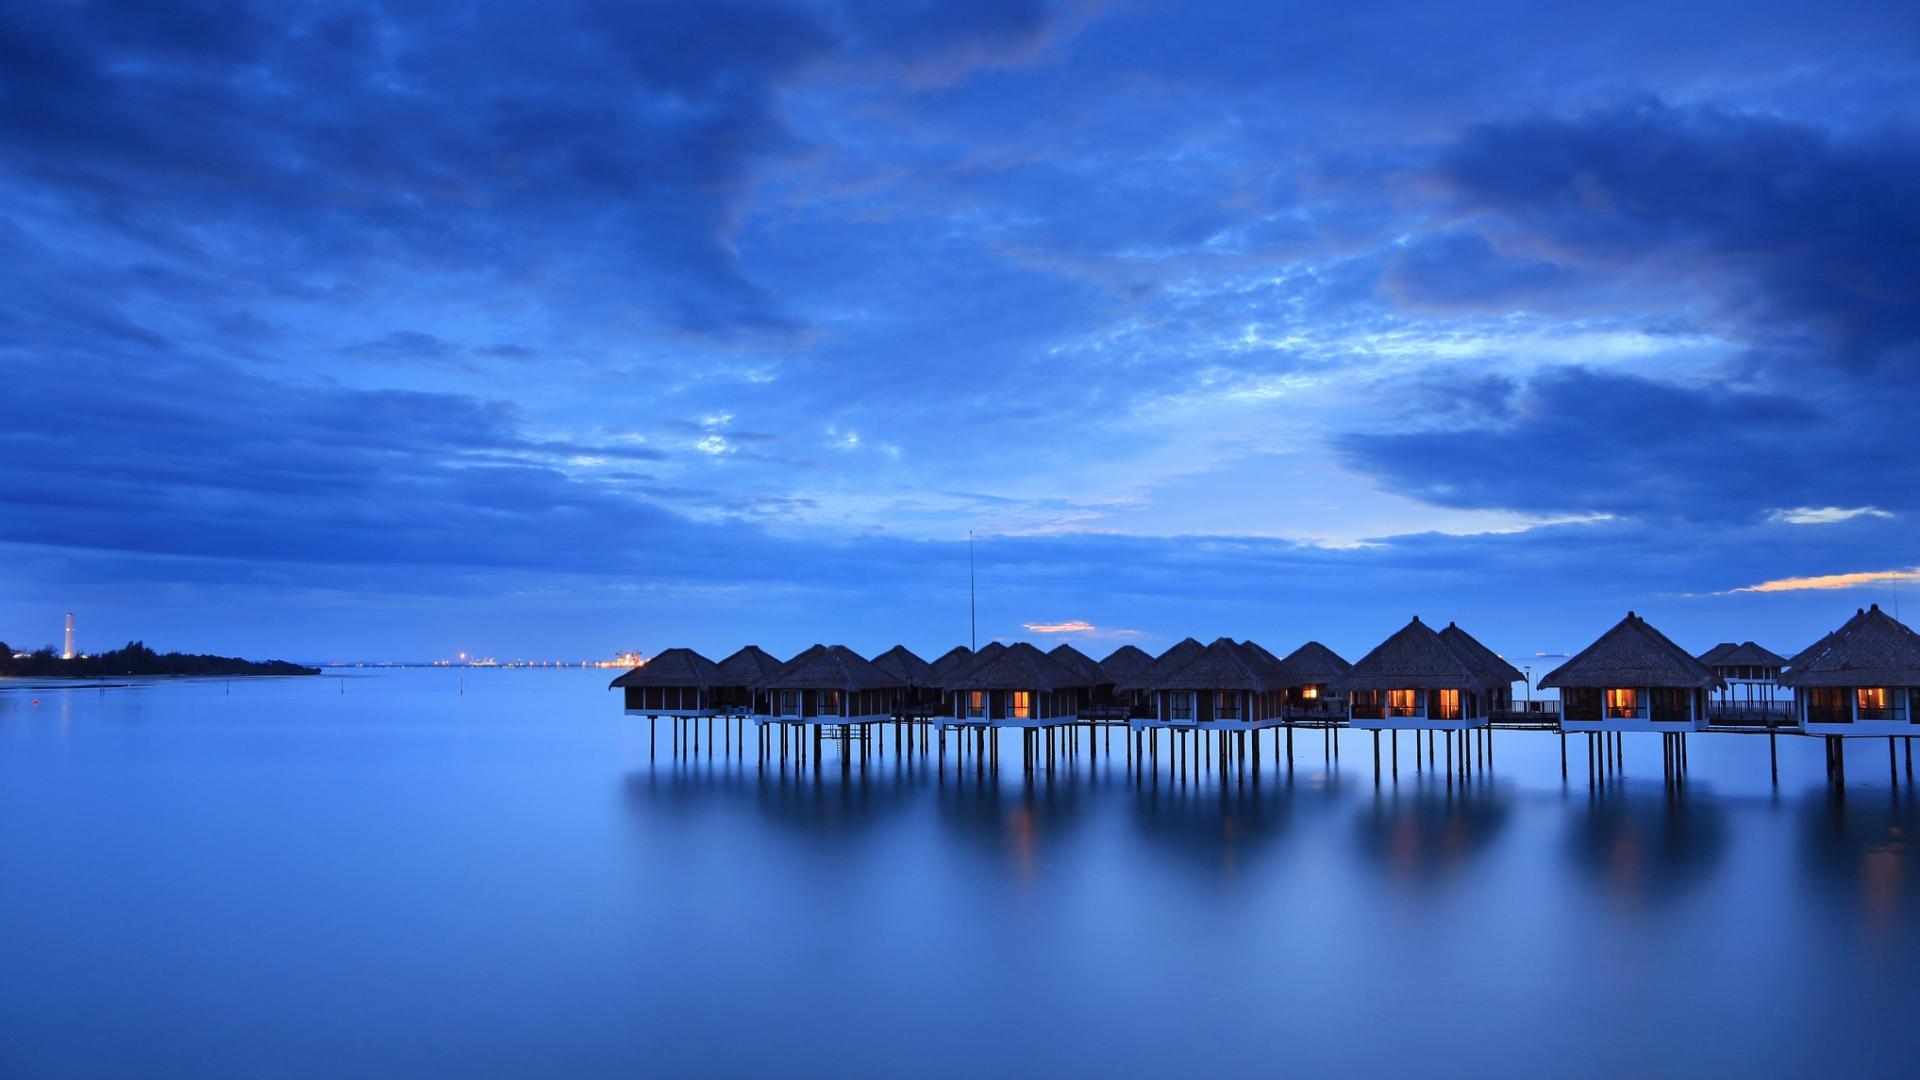 Download Wallpaper 1920x1080 calm sea houses beach malaysia Full 1920x1080